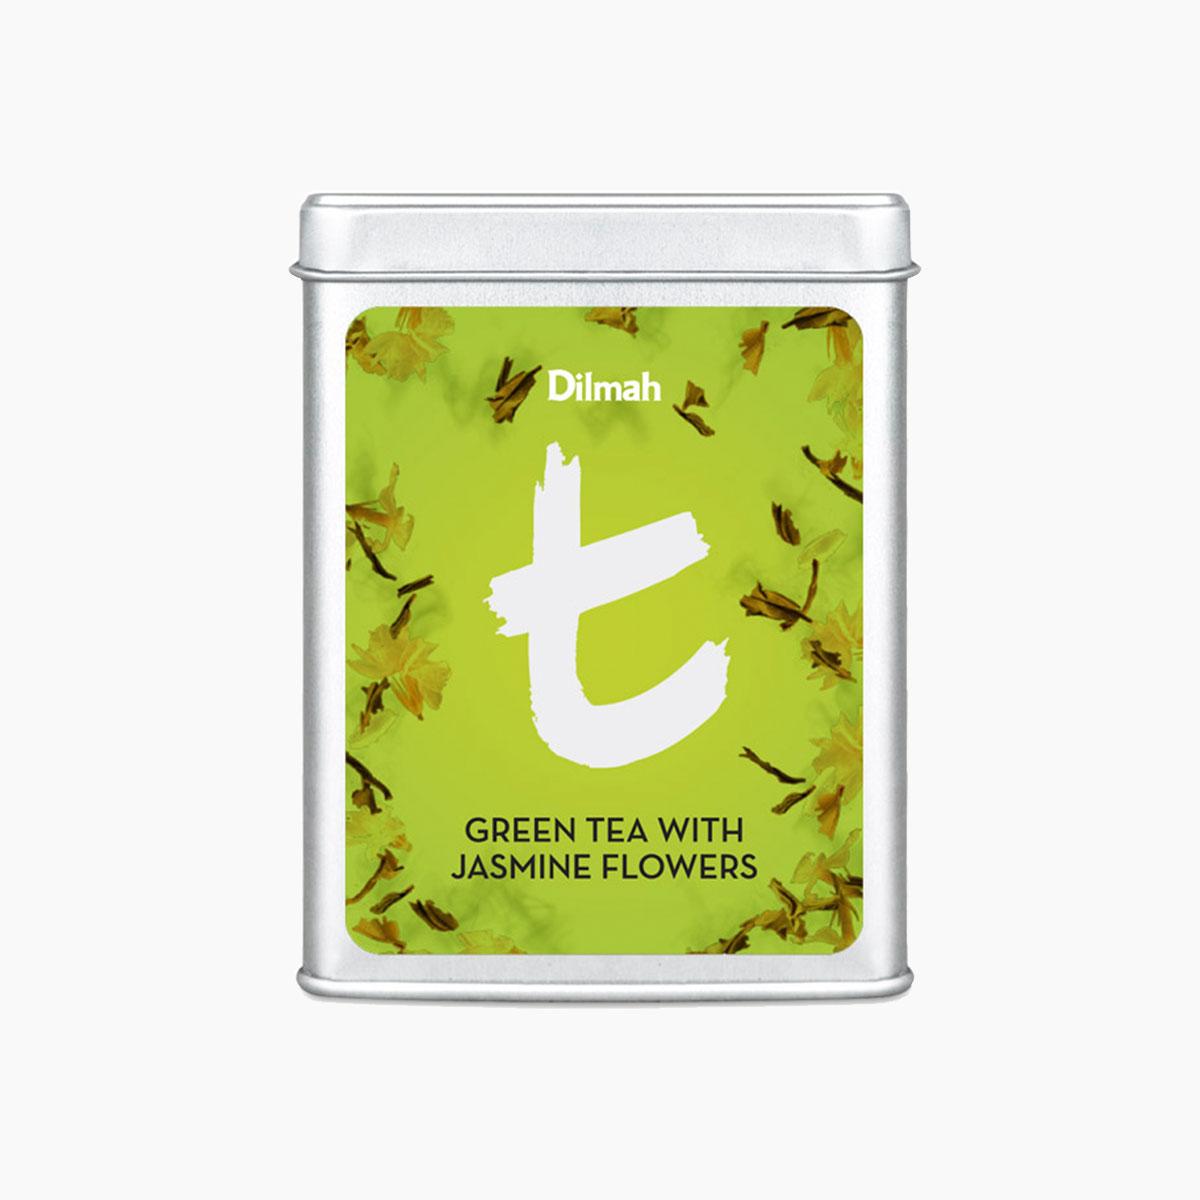 GREEN TEA WITH JASMINE FLOWERS 100g